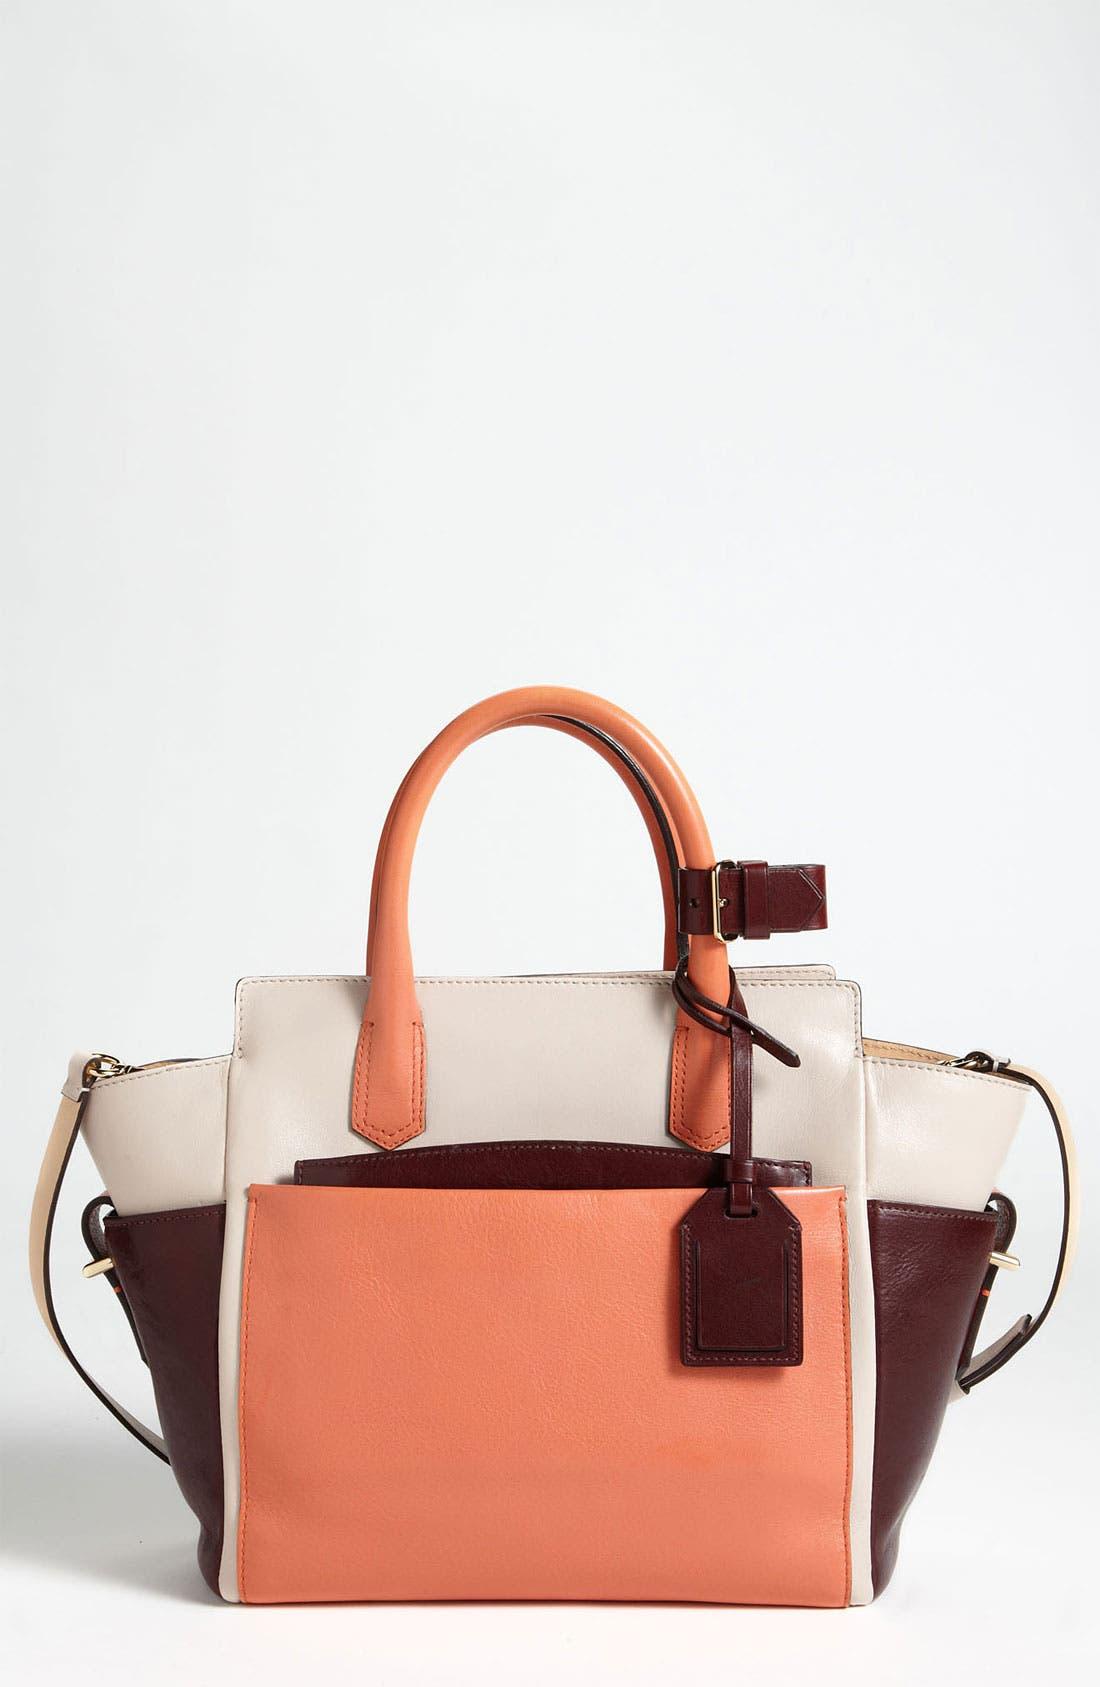 Main Image - Reed Krakoff 'Atlantique - Mini' Colorblock Leather Satchel